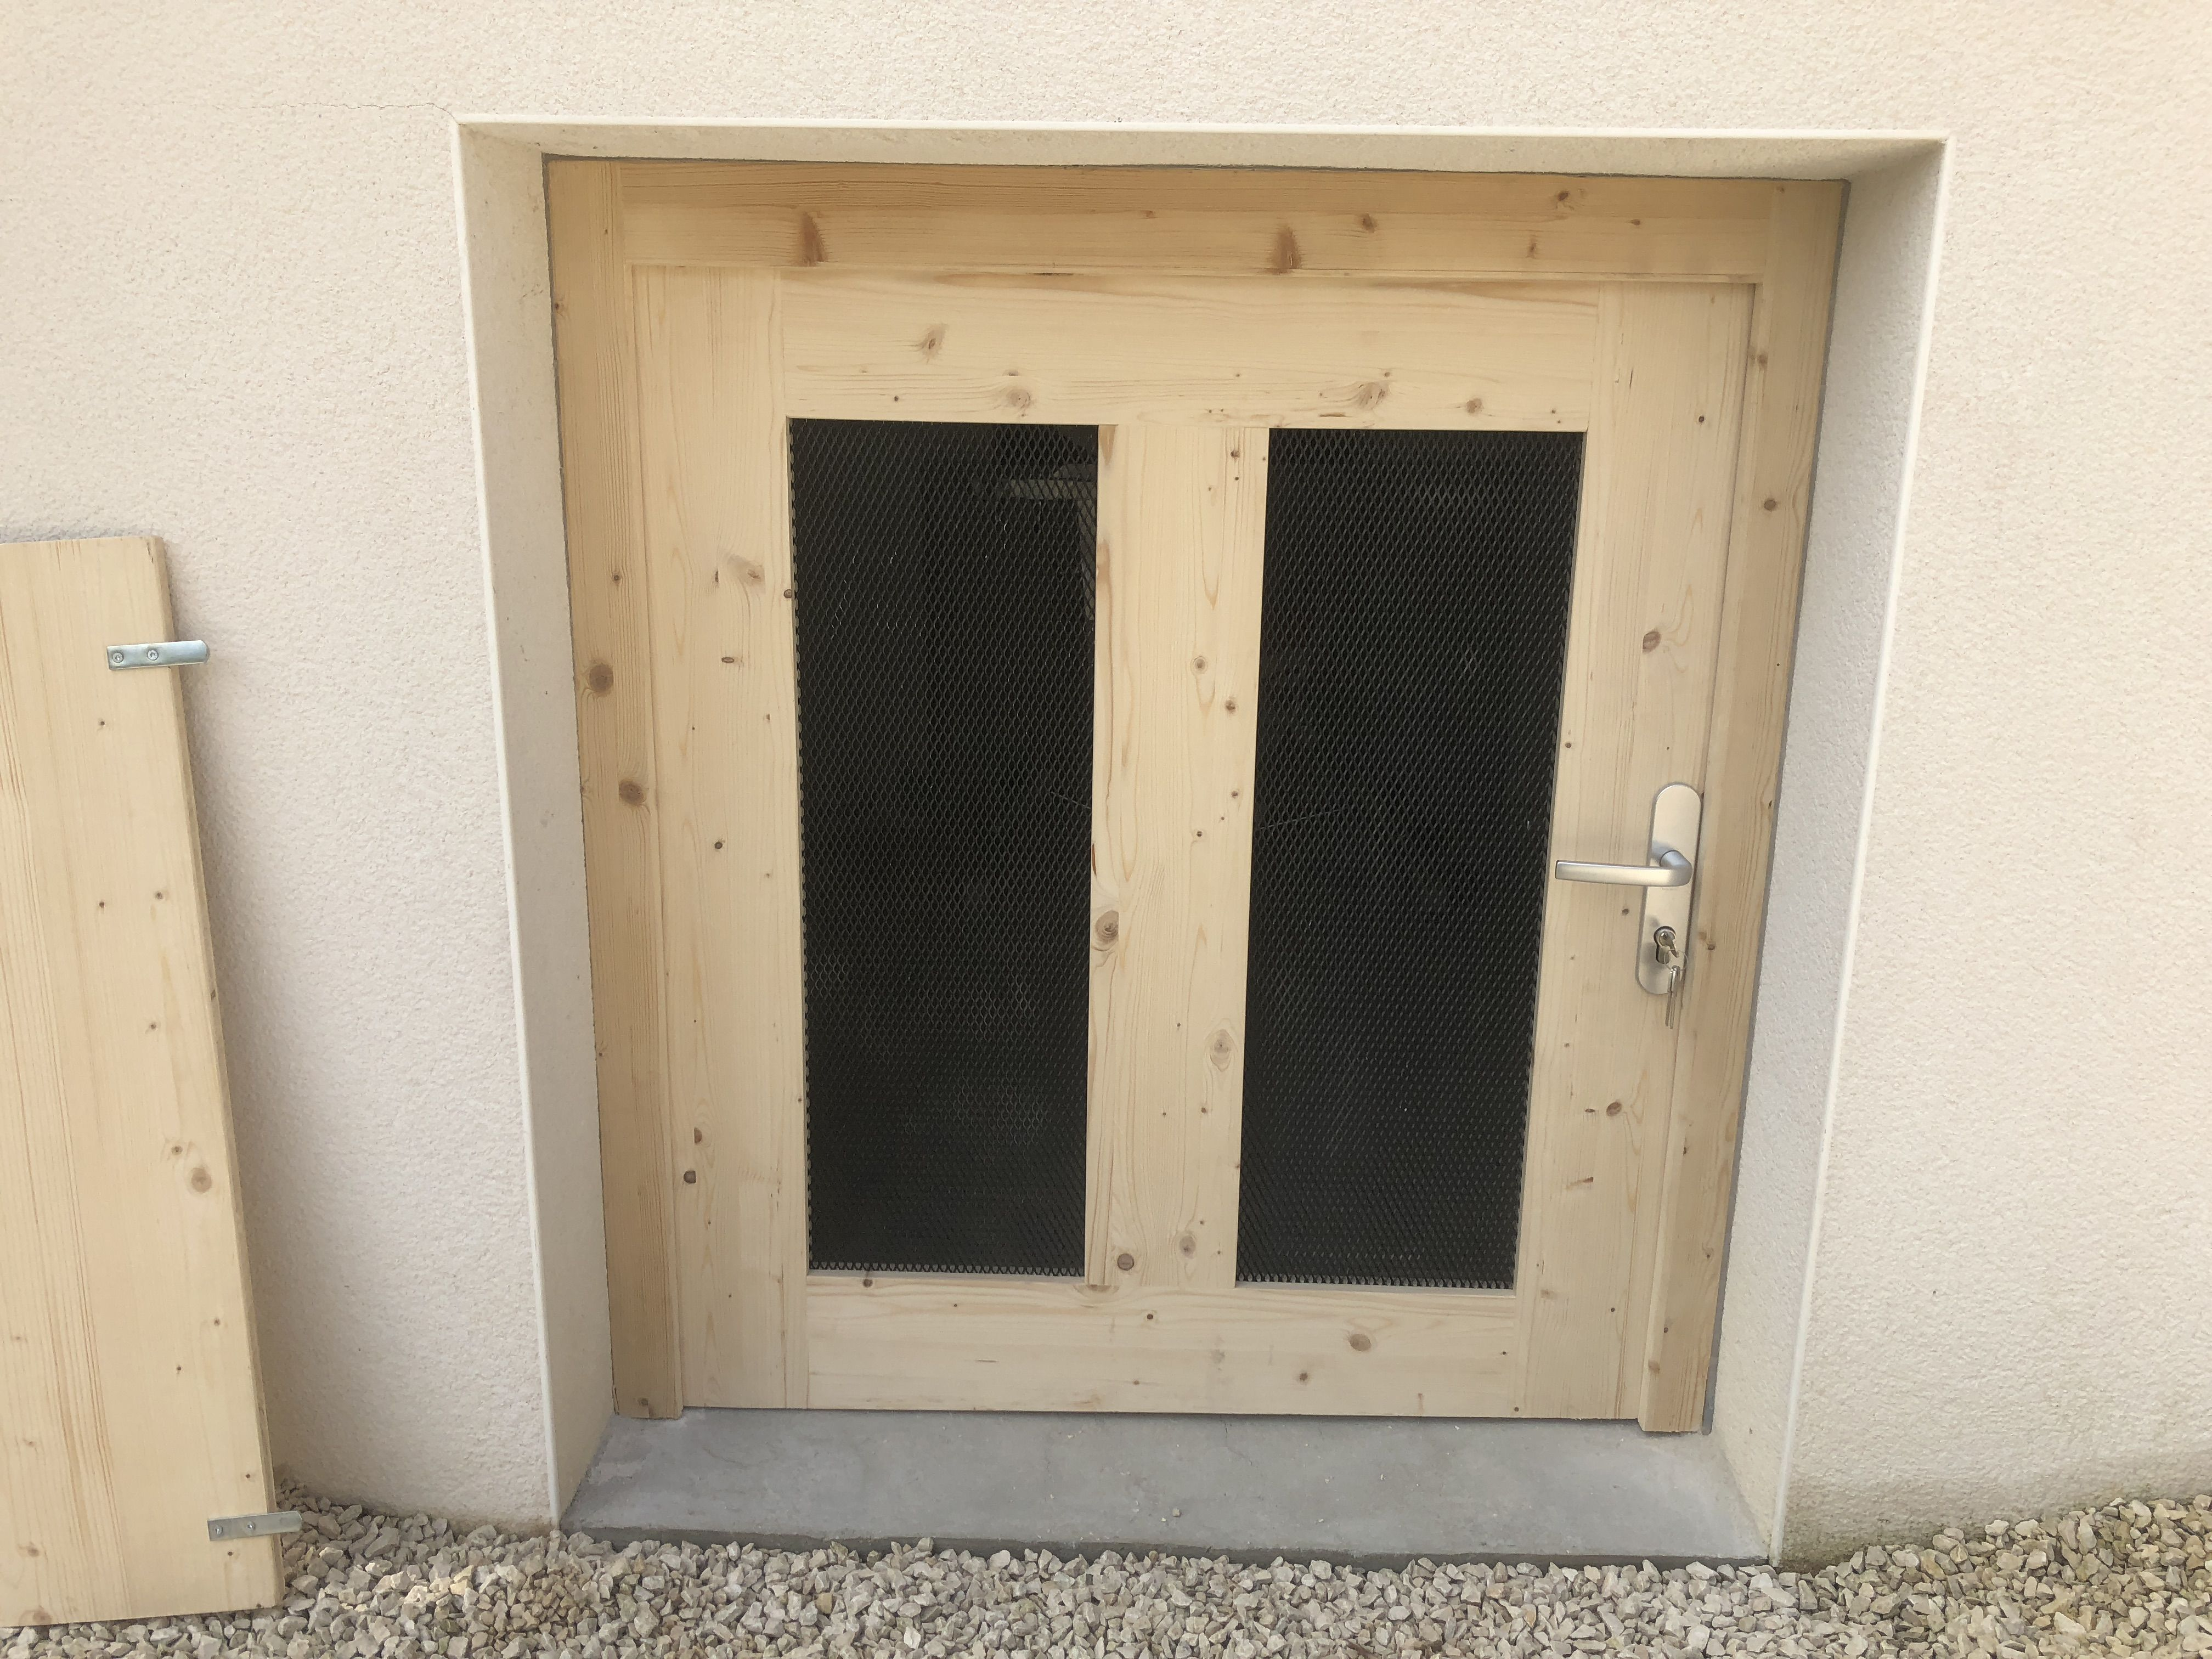 Meuble Cuisine Ikea Vide Sanitaire porte bois massif de vide sanitaire. | vides sanitaires